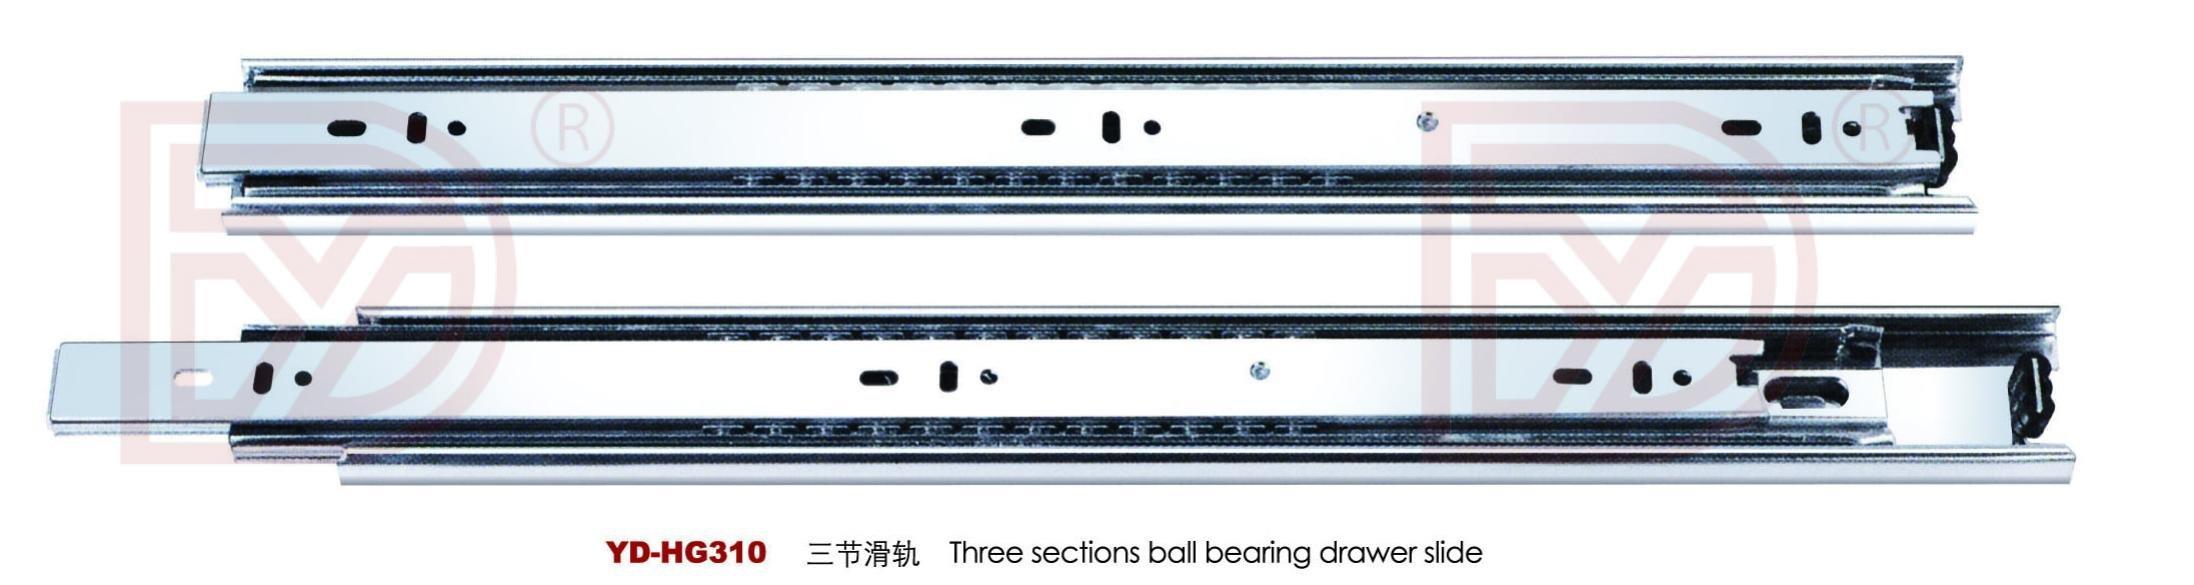 Chine Fabricant Telescopique Ikea Tiroir Diapositives Id De Produit